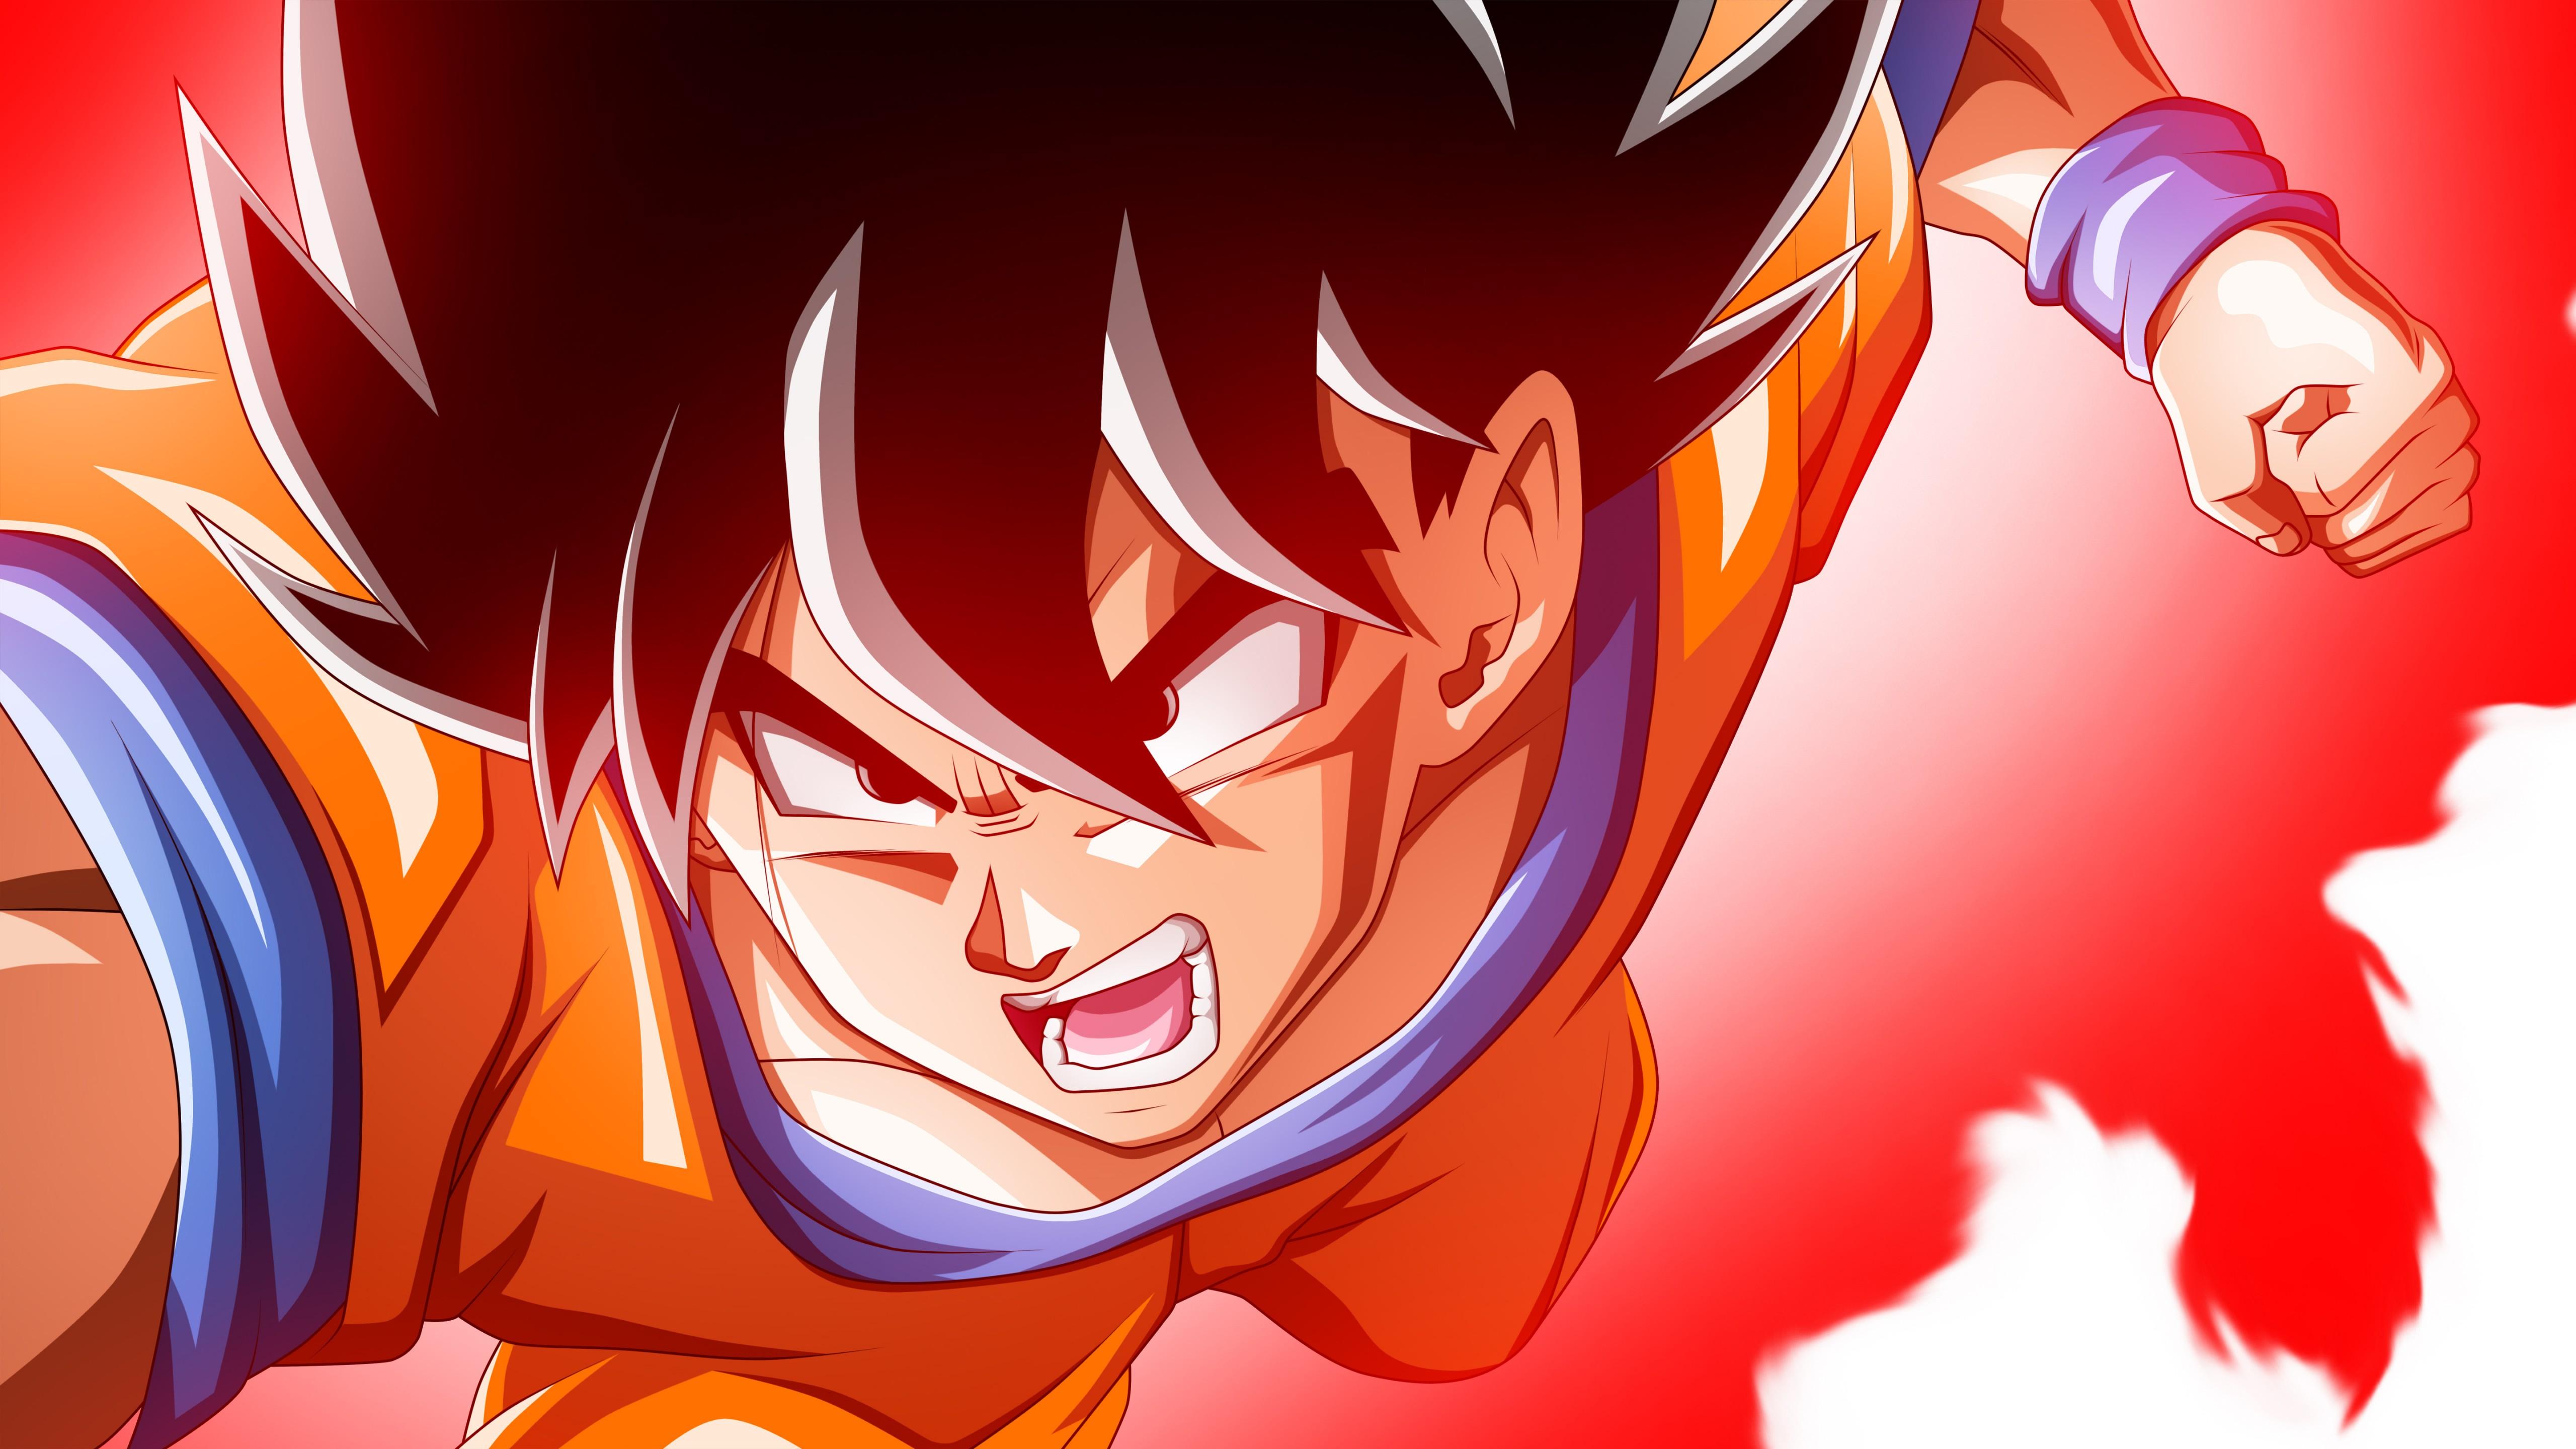 Wallpaper Anime Dragon Ball Super Mystic Gohan 5k Art 14716